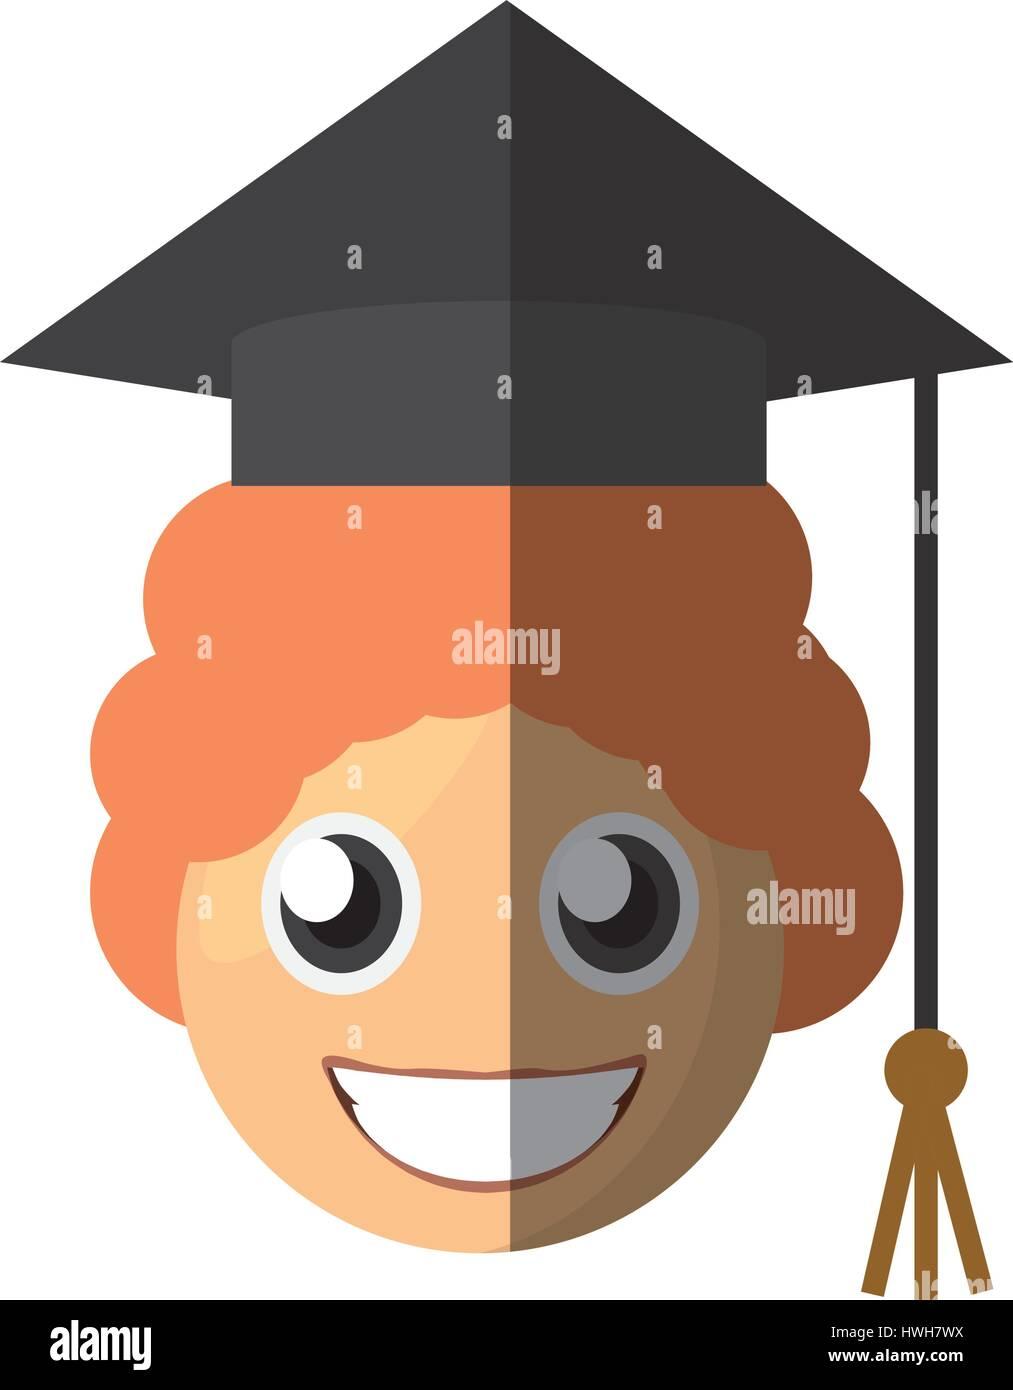 Junge Absolventen Emoticon Cartoon Vektor Abbildung Bild